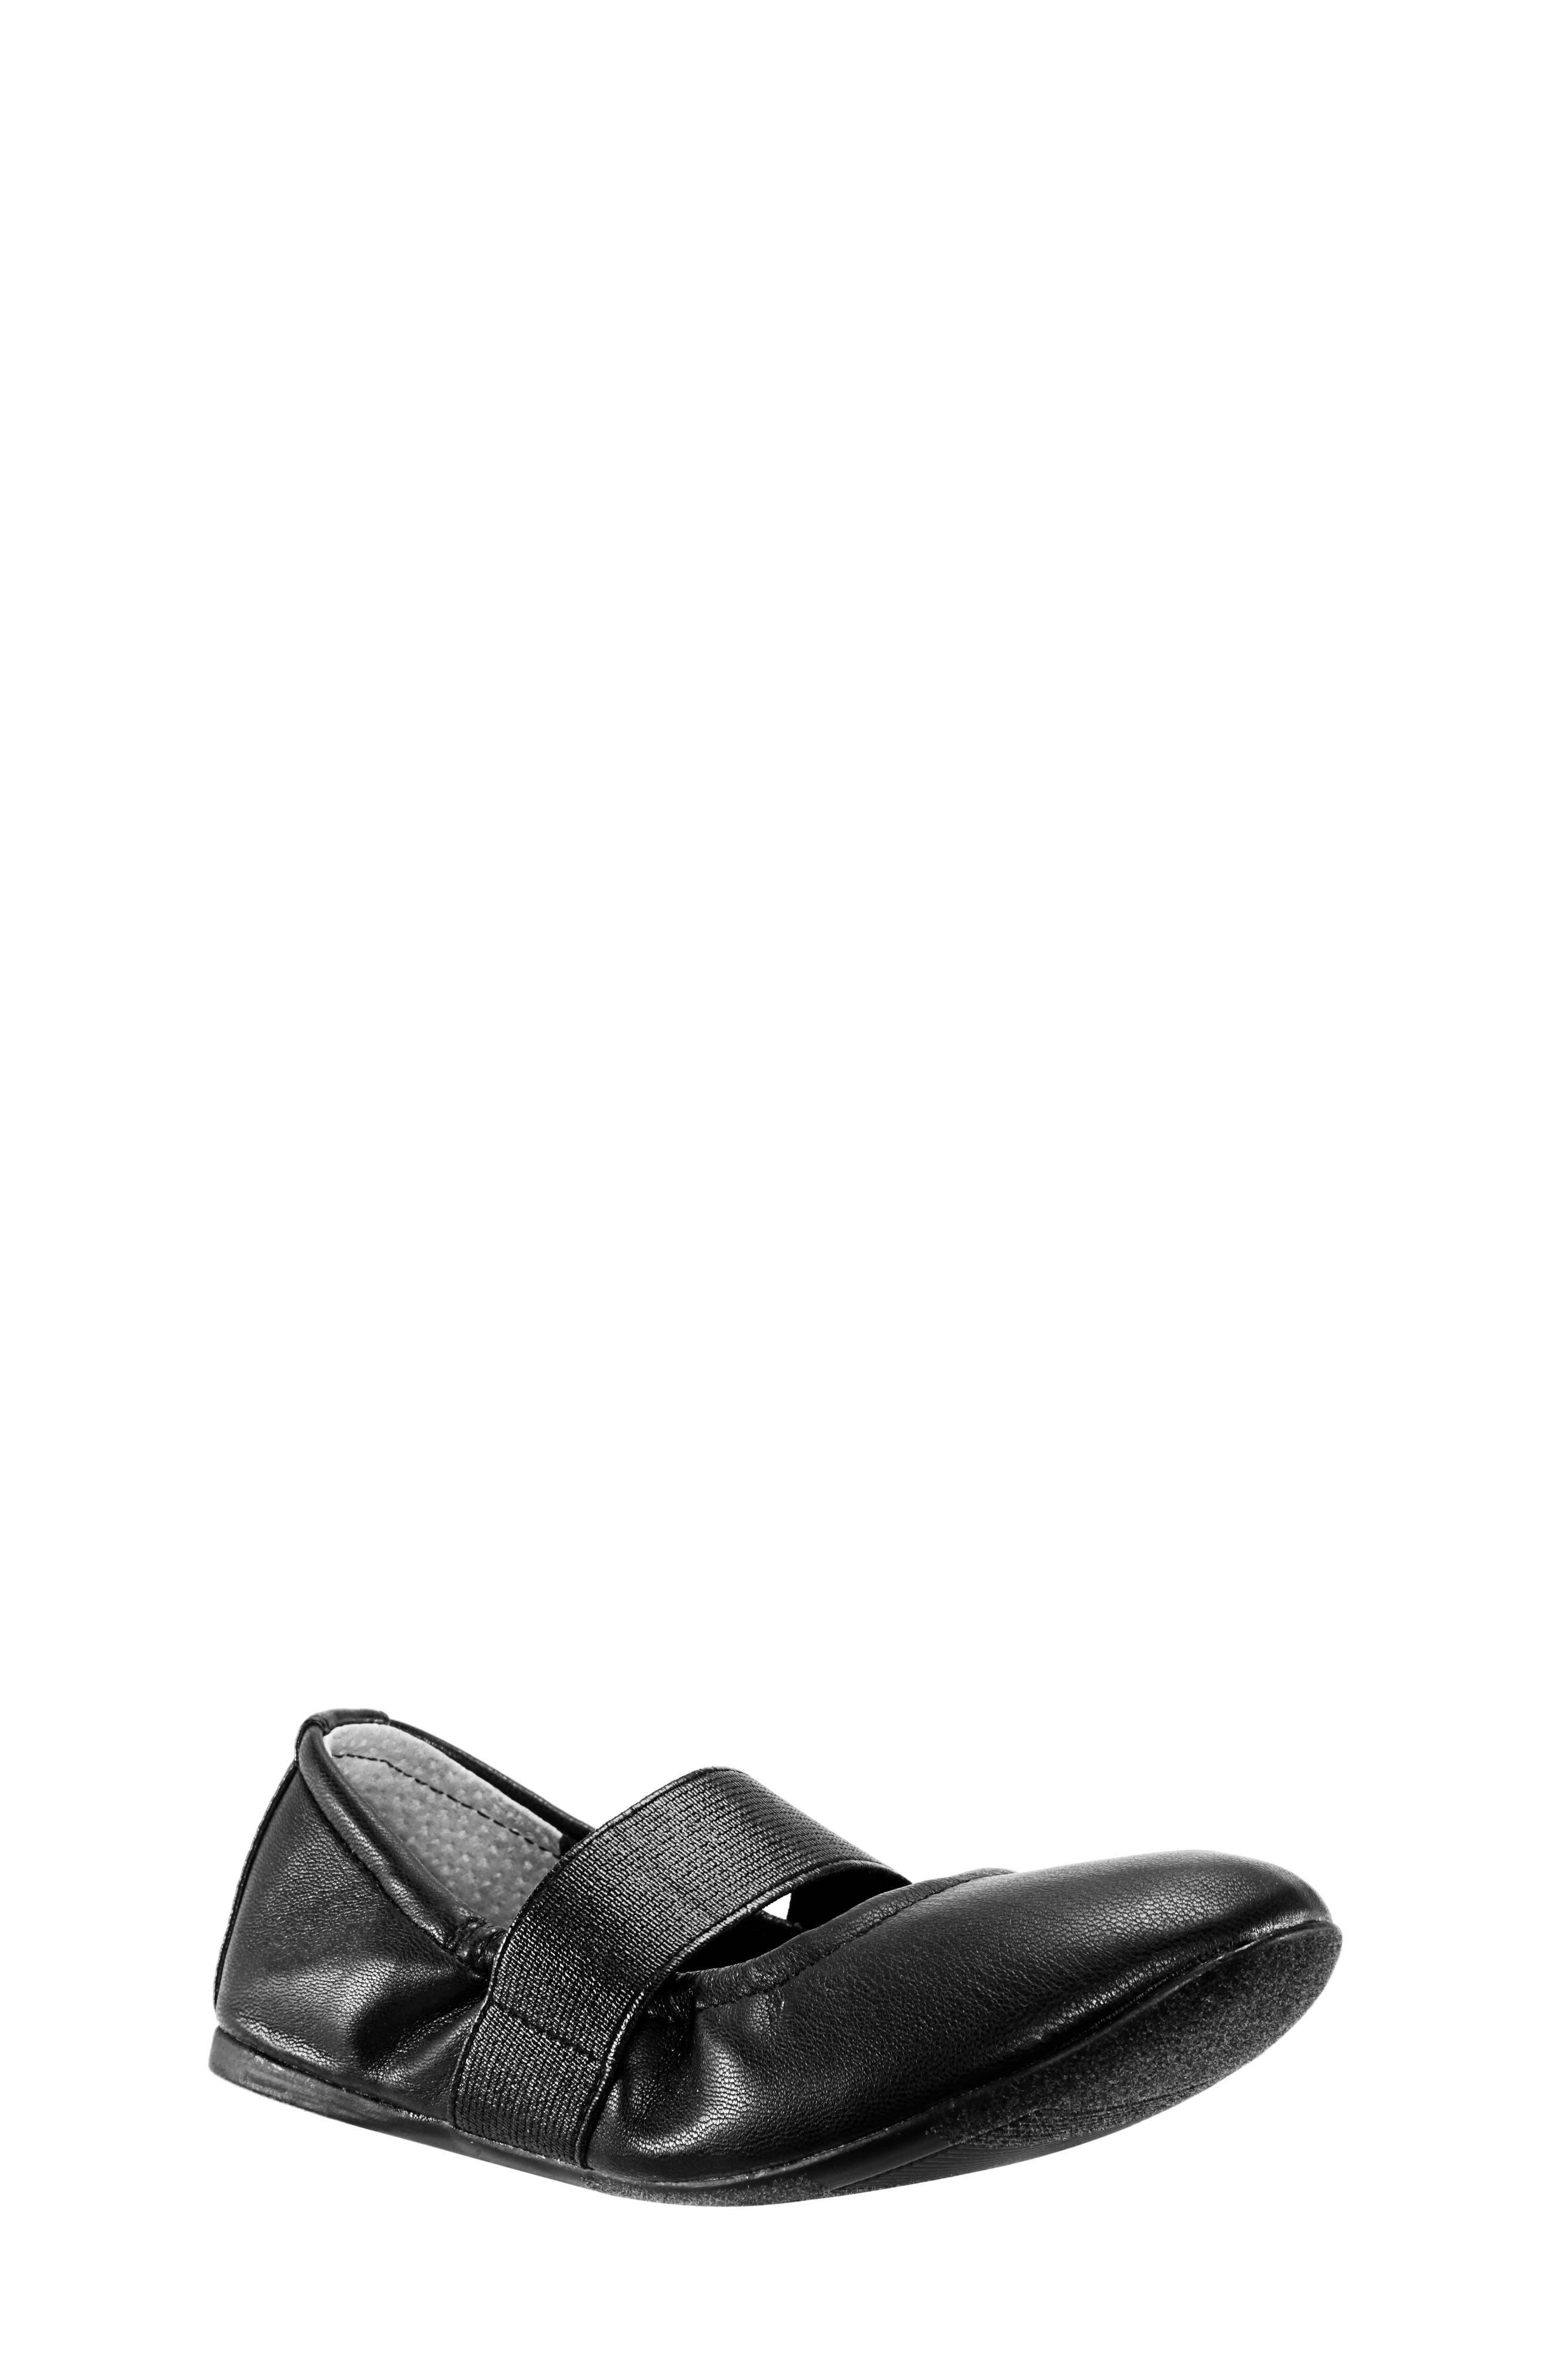 Aylee Ballet Flat,                             Main thumbnail 1, color,                             BLACK SMOOTH